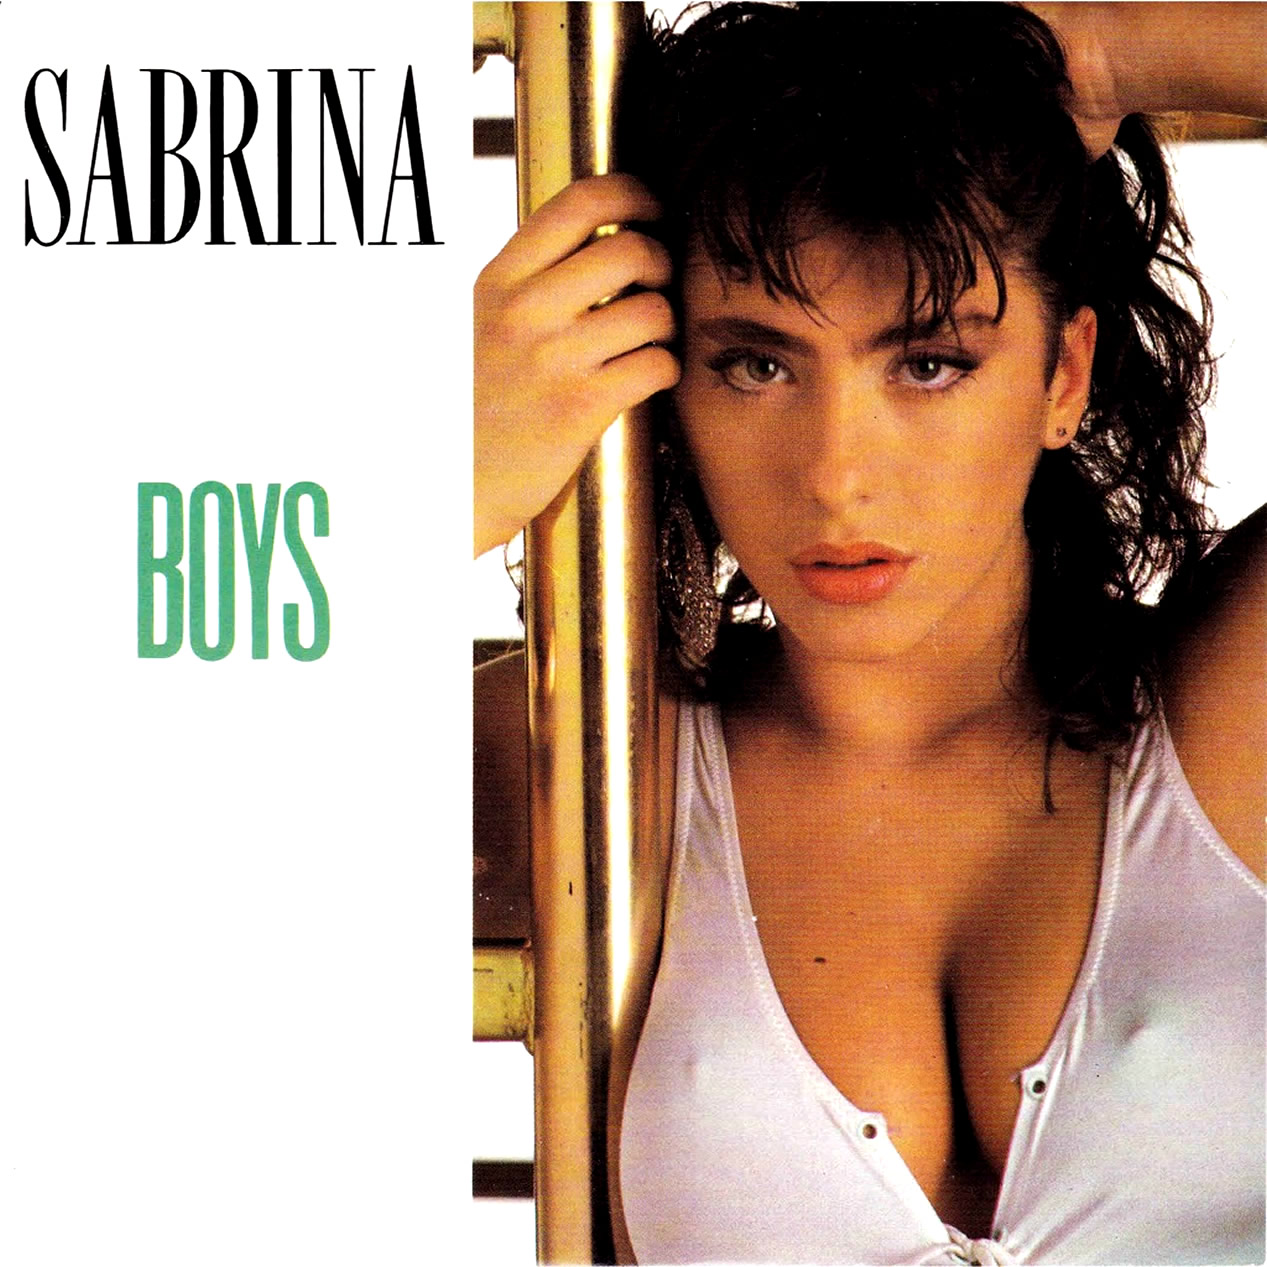 Sabrina avec boys boys boys